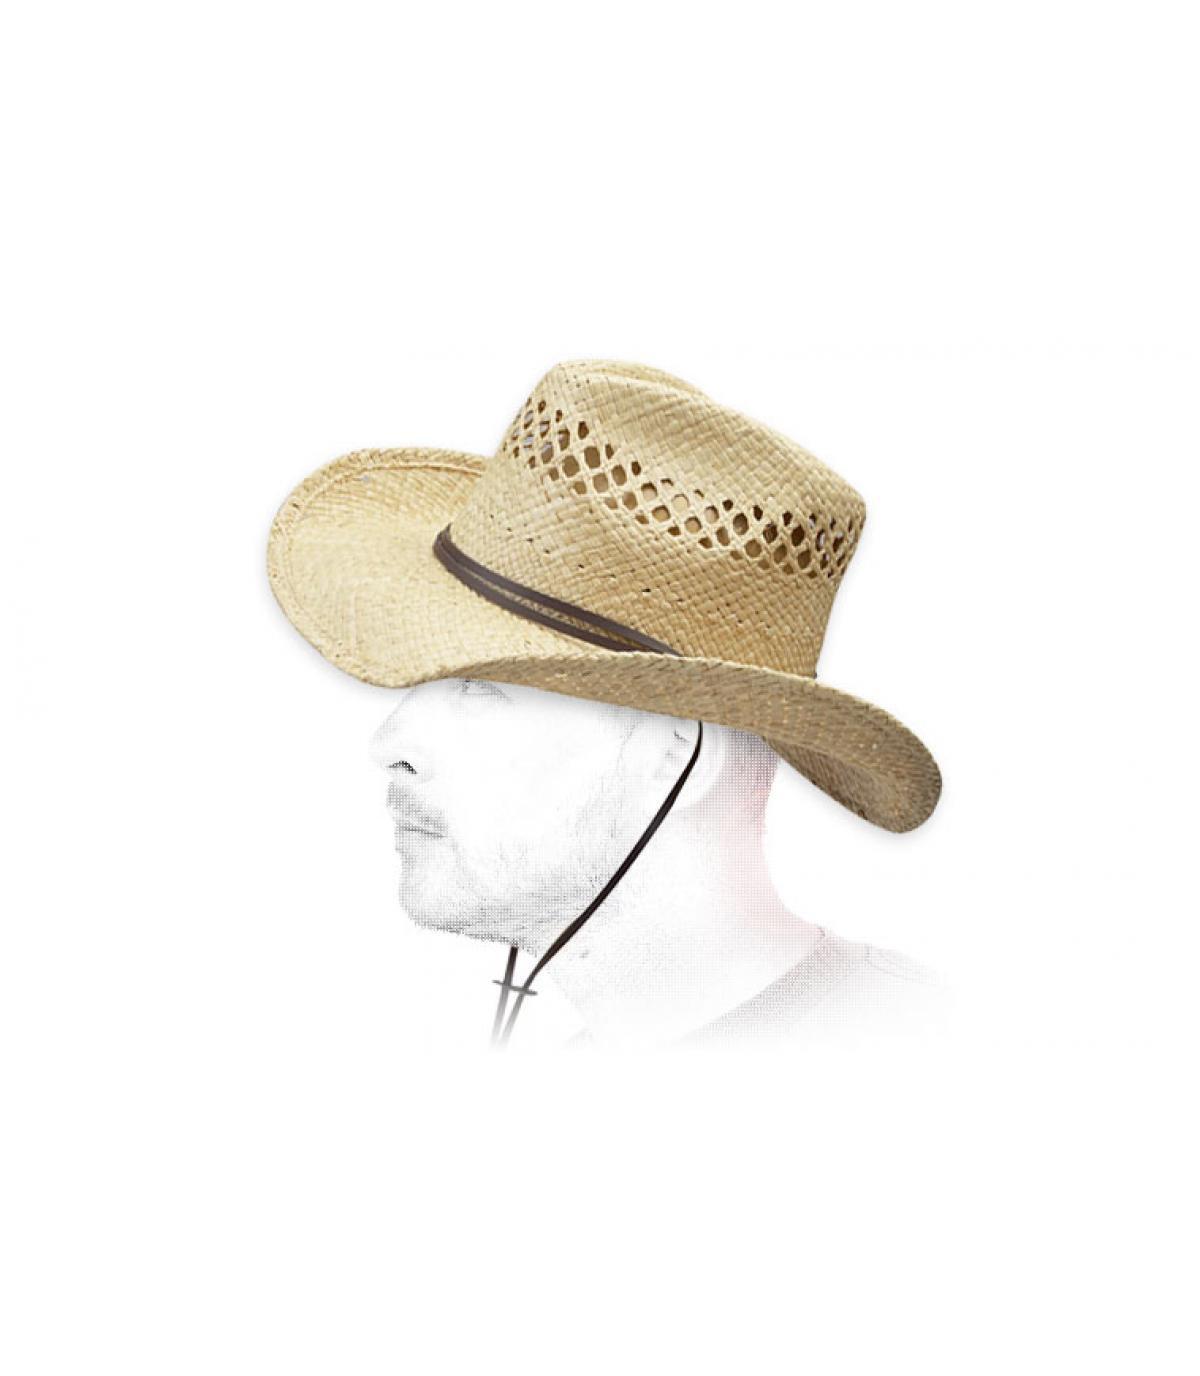 Detalles Sombrero Larimore raffia imagen 4